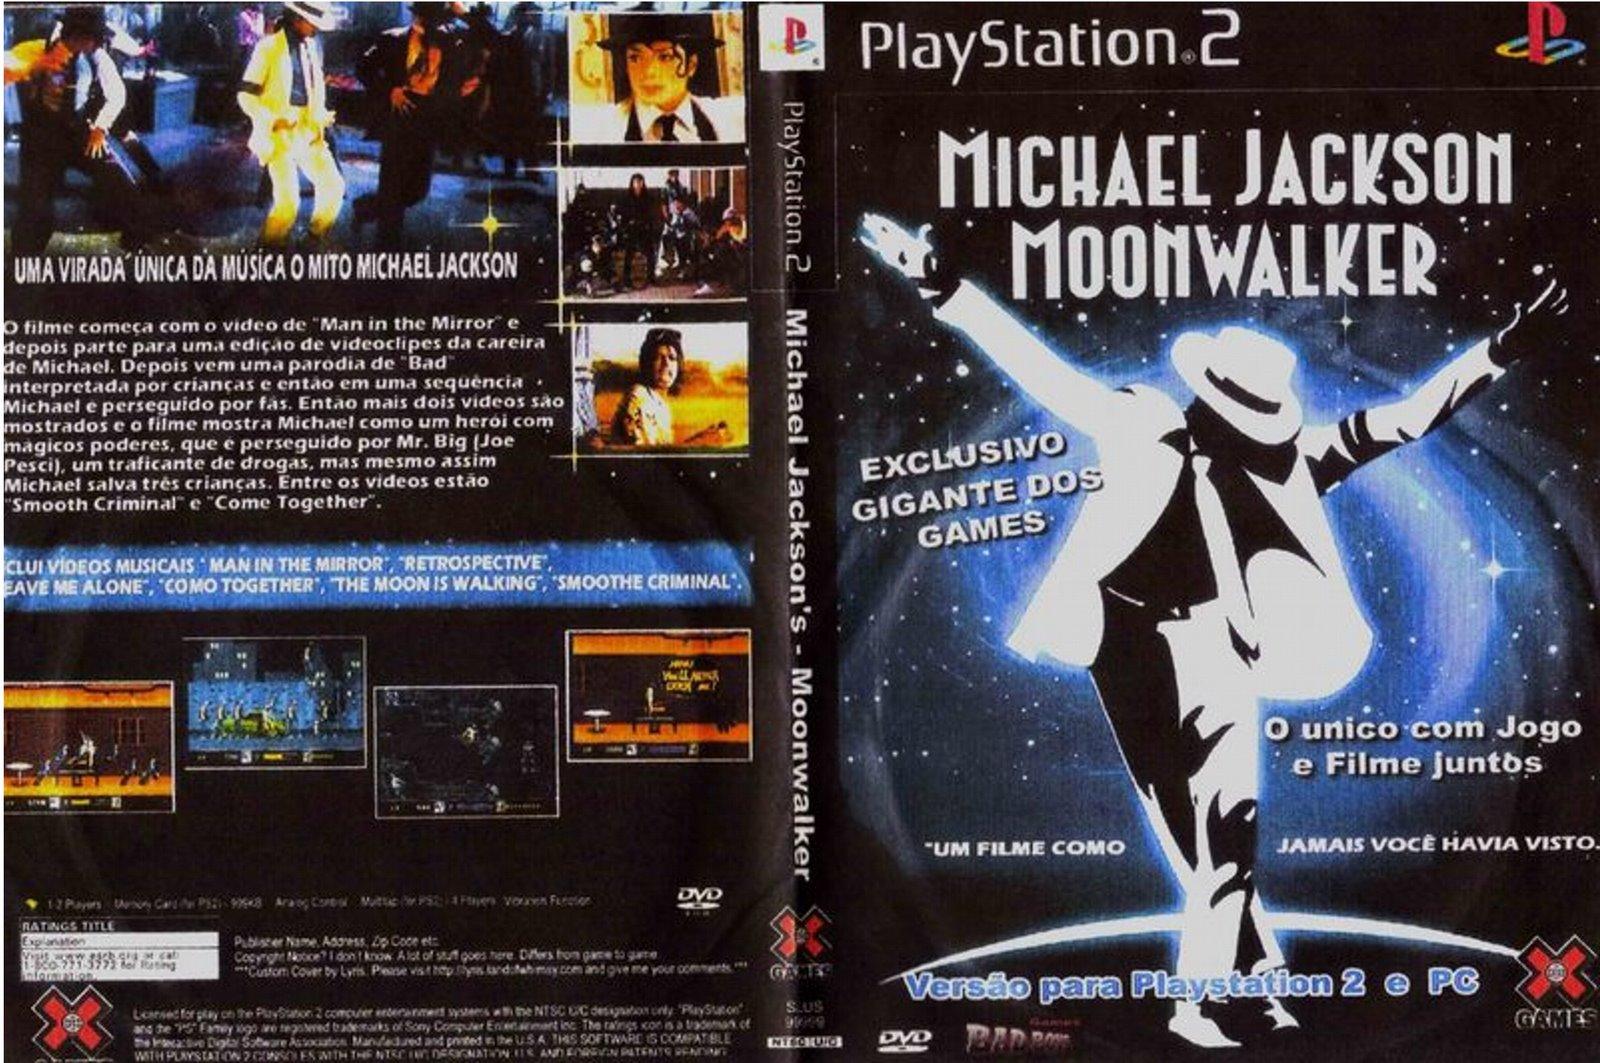 http://1.bp.blogspot.com/_jl_O7YDvp6s/TTBaSH9YrLI/AAAAAAAAAwE/yTNSRGTOsCI/s1600/Michael+Jackson+-+Moon+Walker.jpg